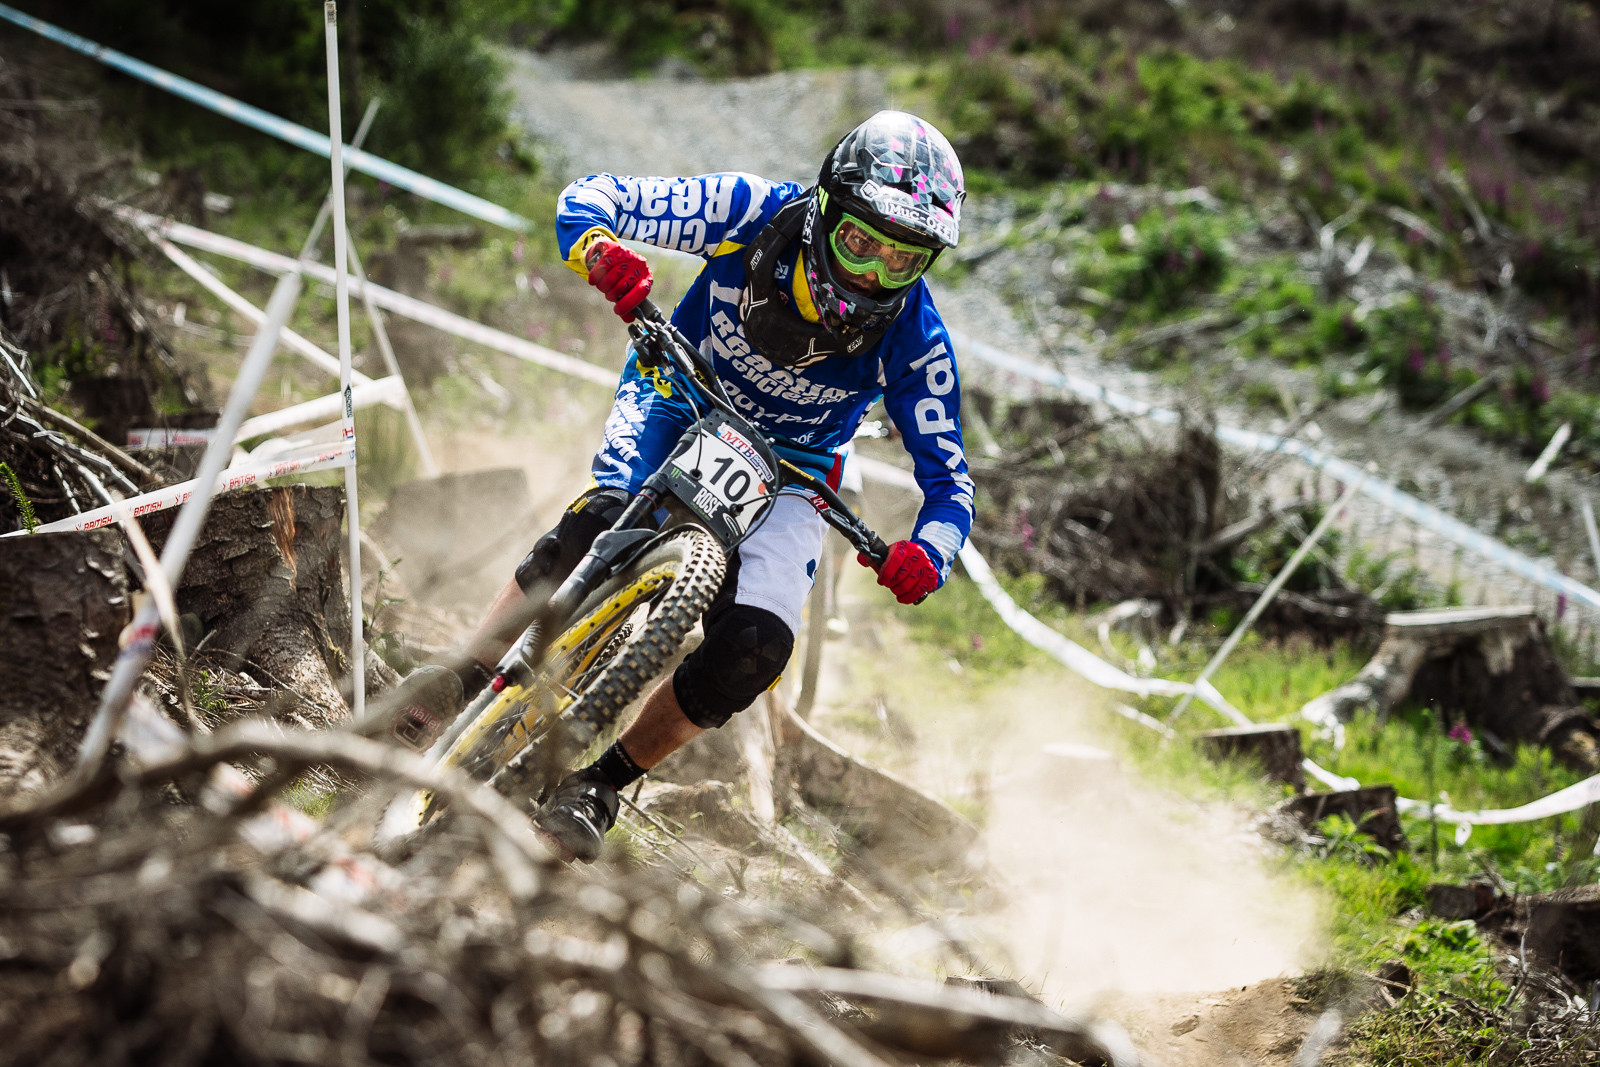 Mike Jones, 3rd Place, British DH Series, Bala - RACE REPORT - 2015 British Downhill Series Bala - Mountain Biking Pictures - Vital MTB